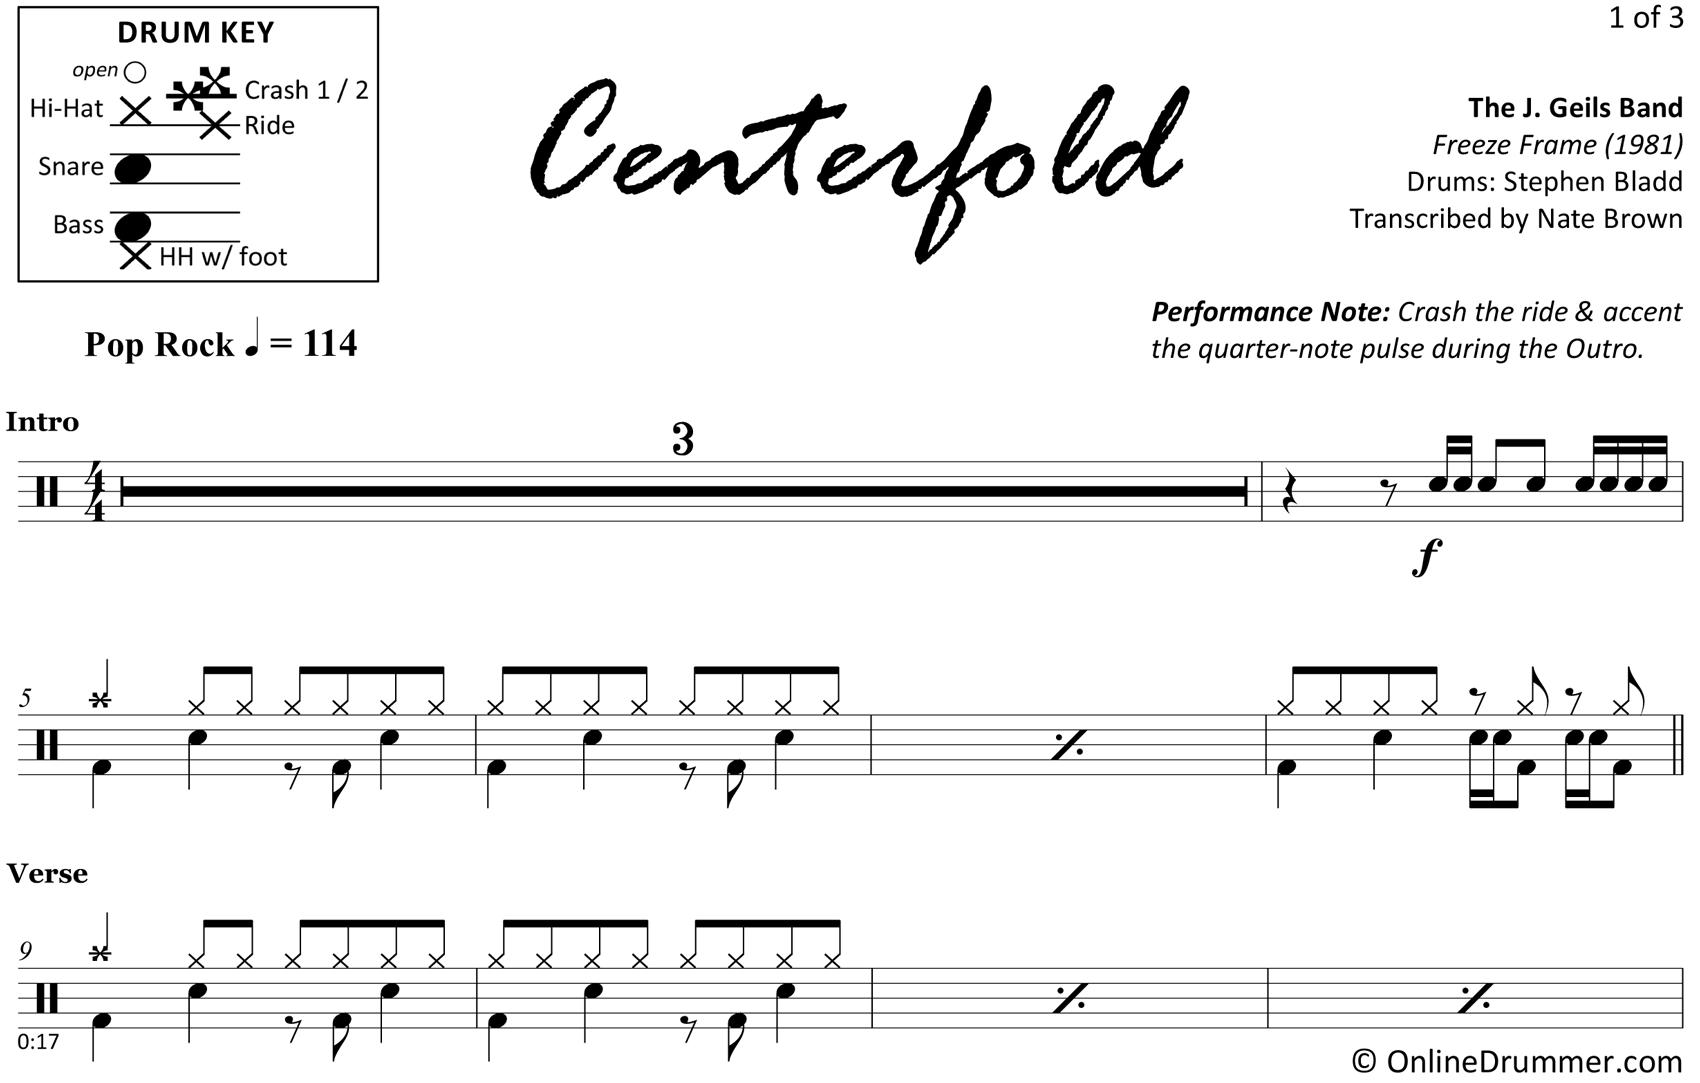 Centerfold - The J. Geils Band - Drum Sheet Music